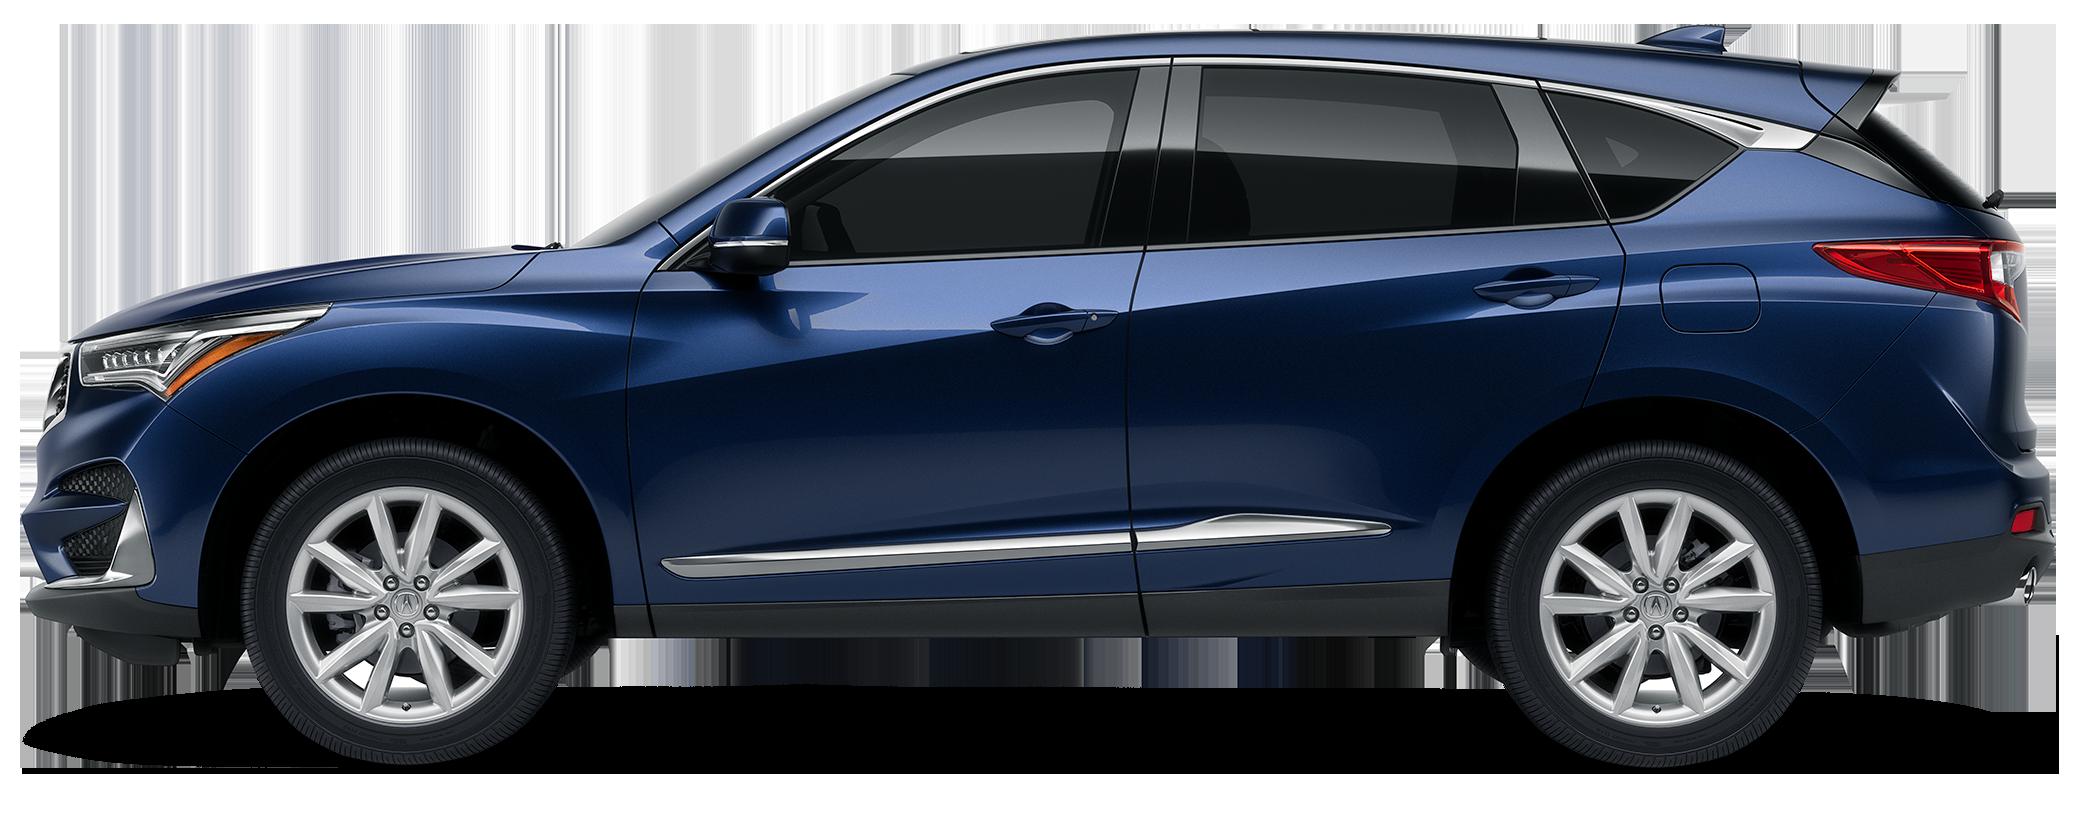 2021 Acura RDX SUV Base